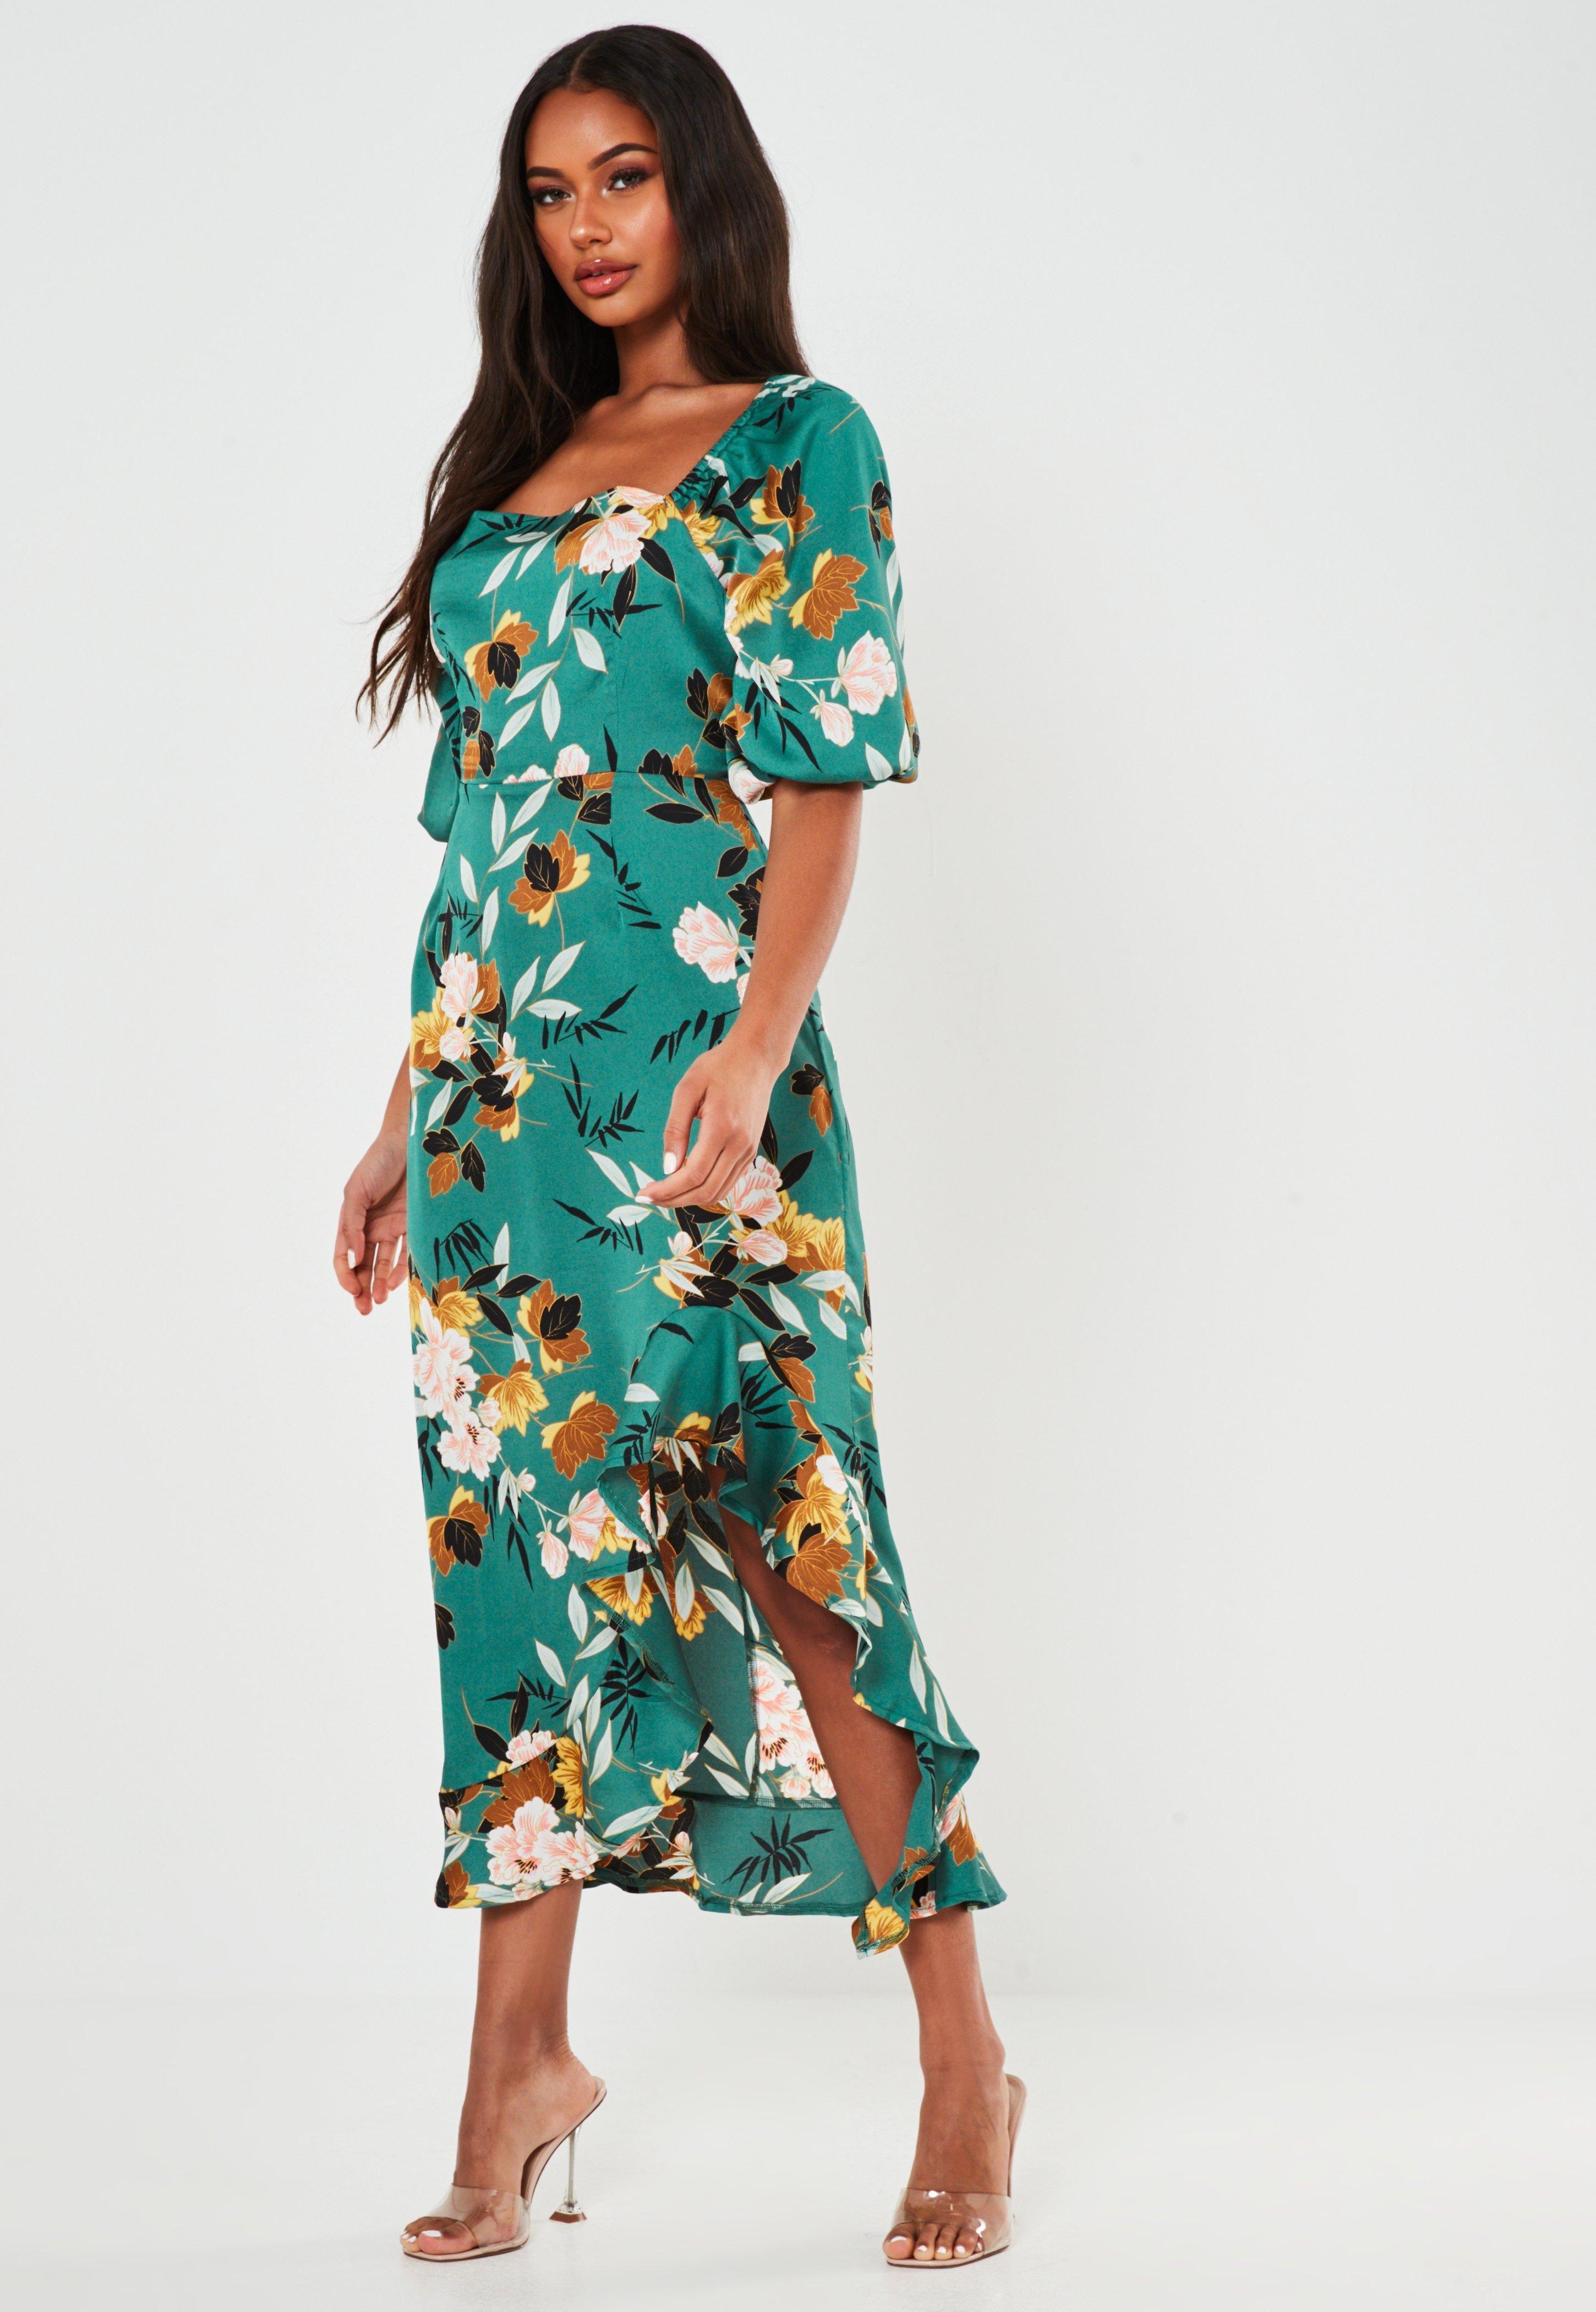 Green Floral Print Ruffle Hem Midi Dress Sponsored Print Affiliate Floral Green Midi Short Sleeve Dress Womens Dresses Trending Dresses [ 4200 x 2900 Pixel ]